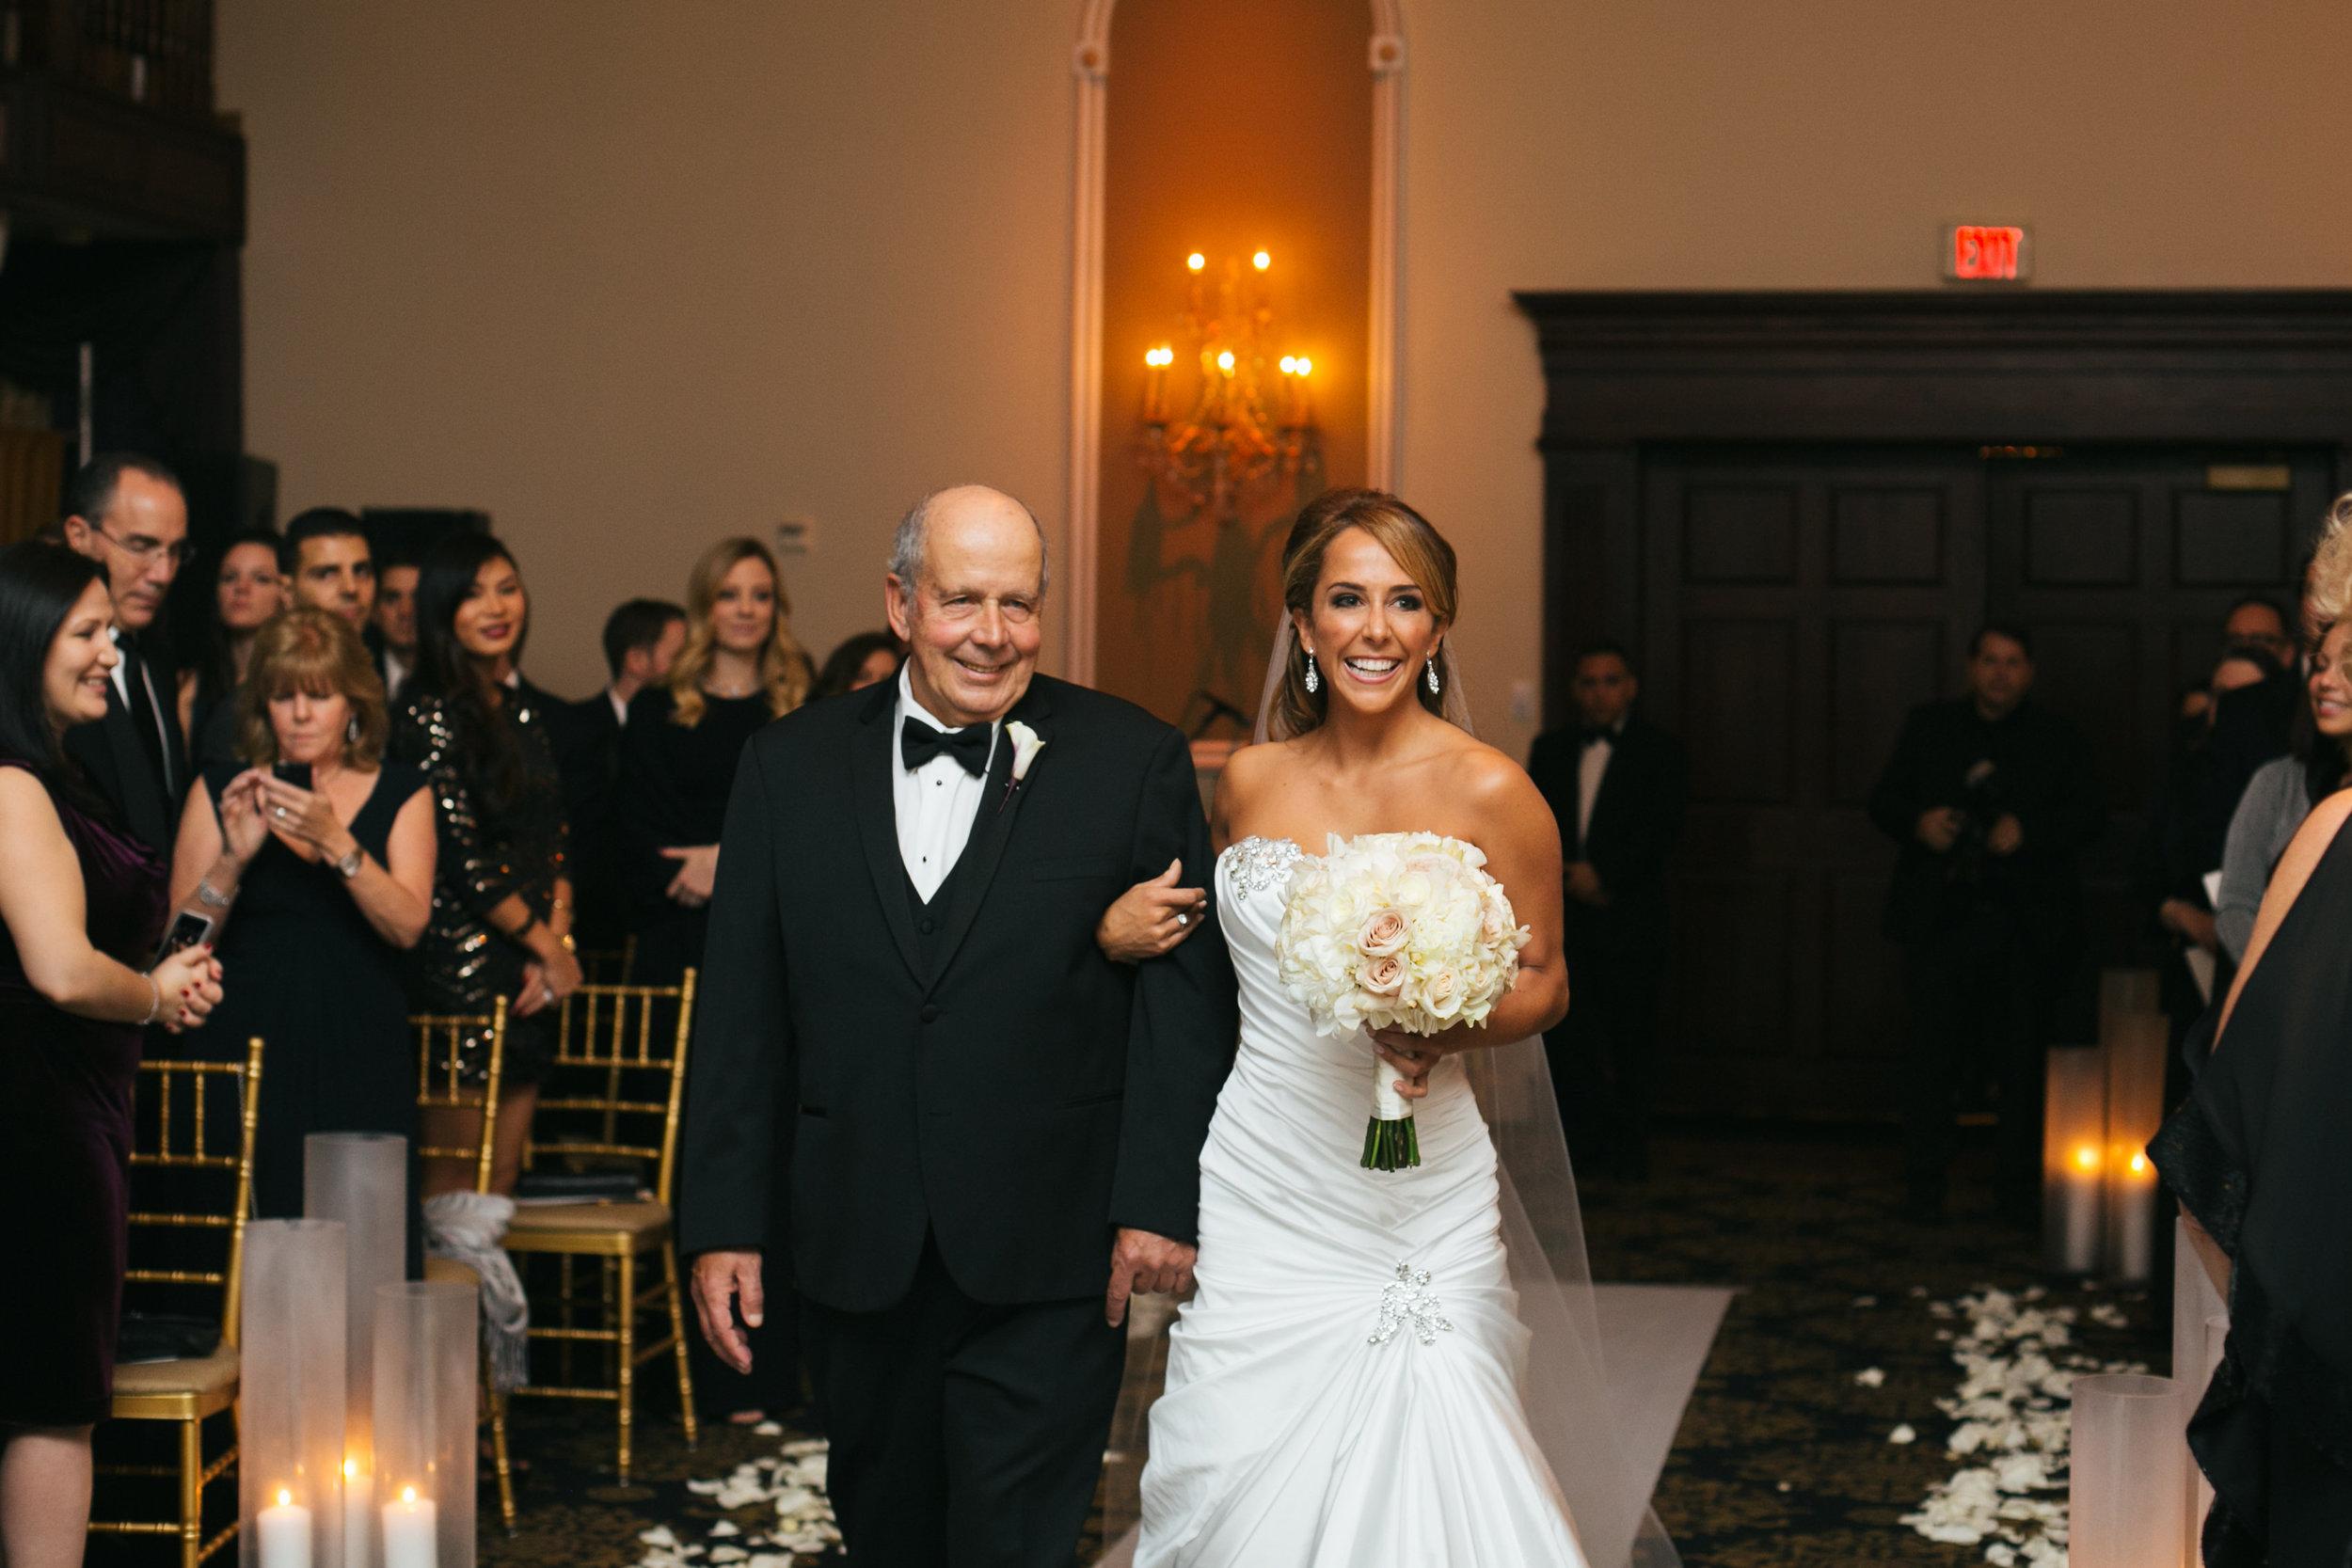 Ceci_New_York_Custom_Invitation_ New_Jersey_Wedding_Luxury_Personalized_Ceci_Style_Bride_Foil_Stamping43.jpg